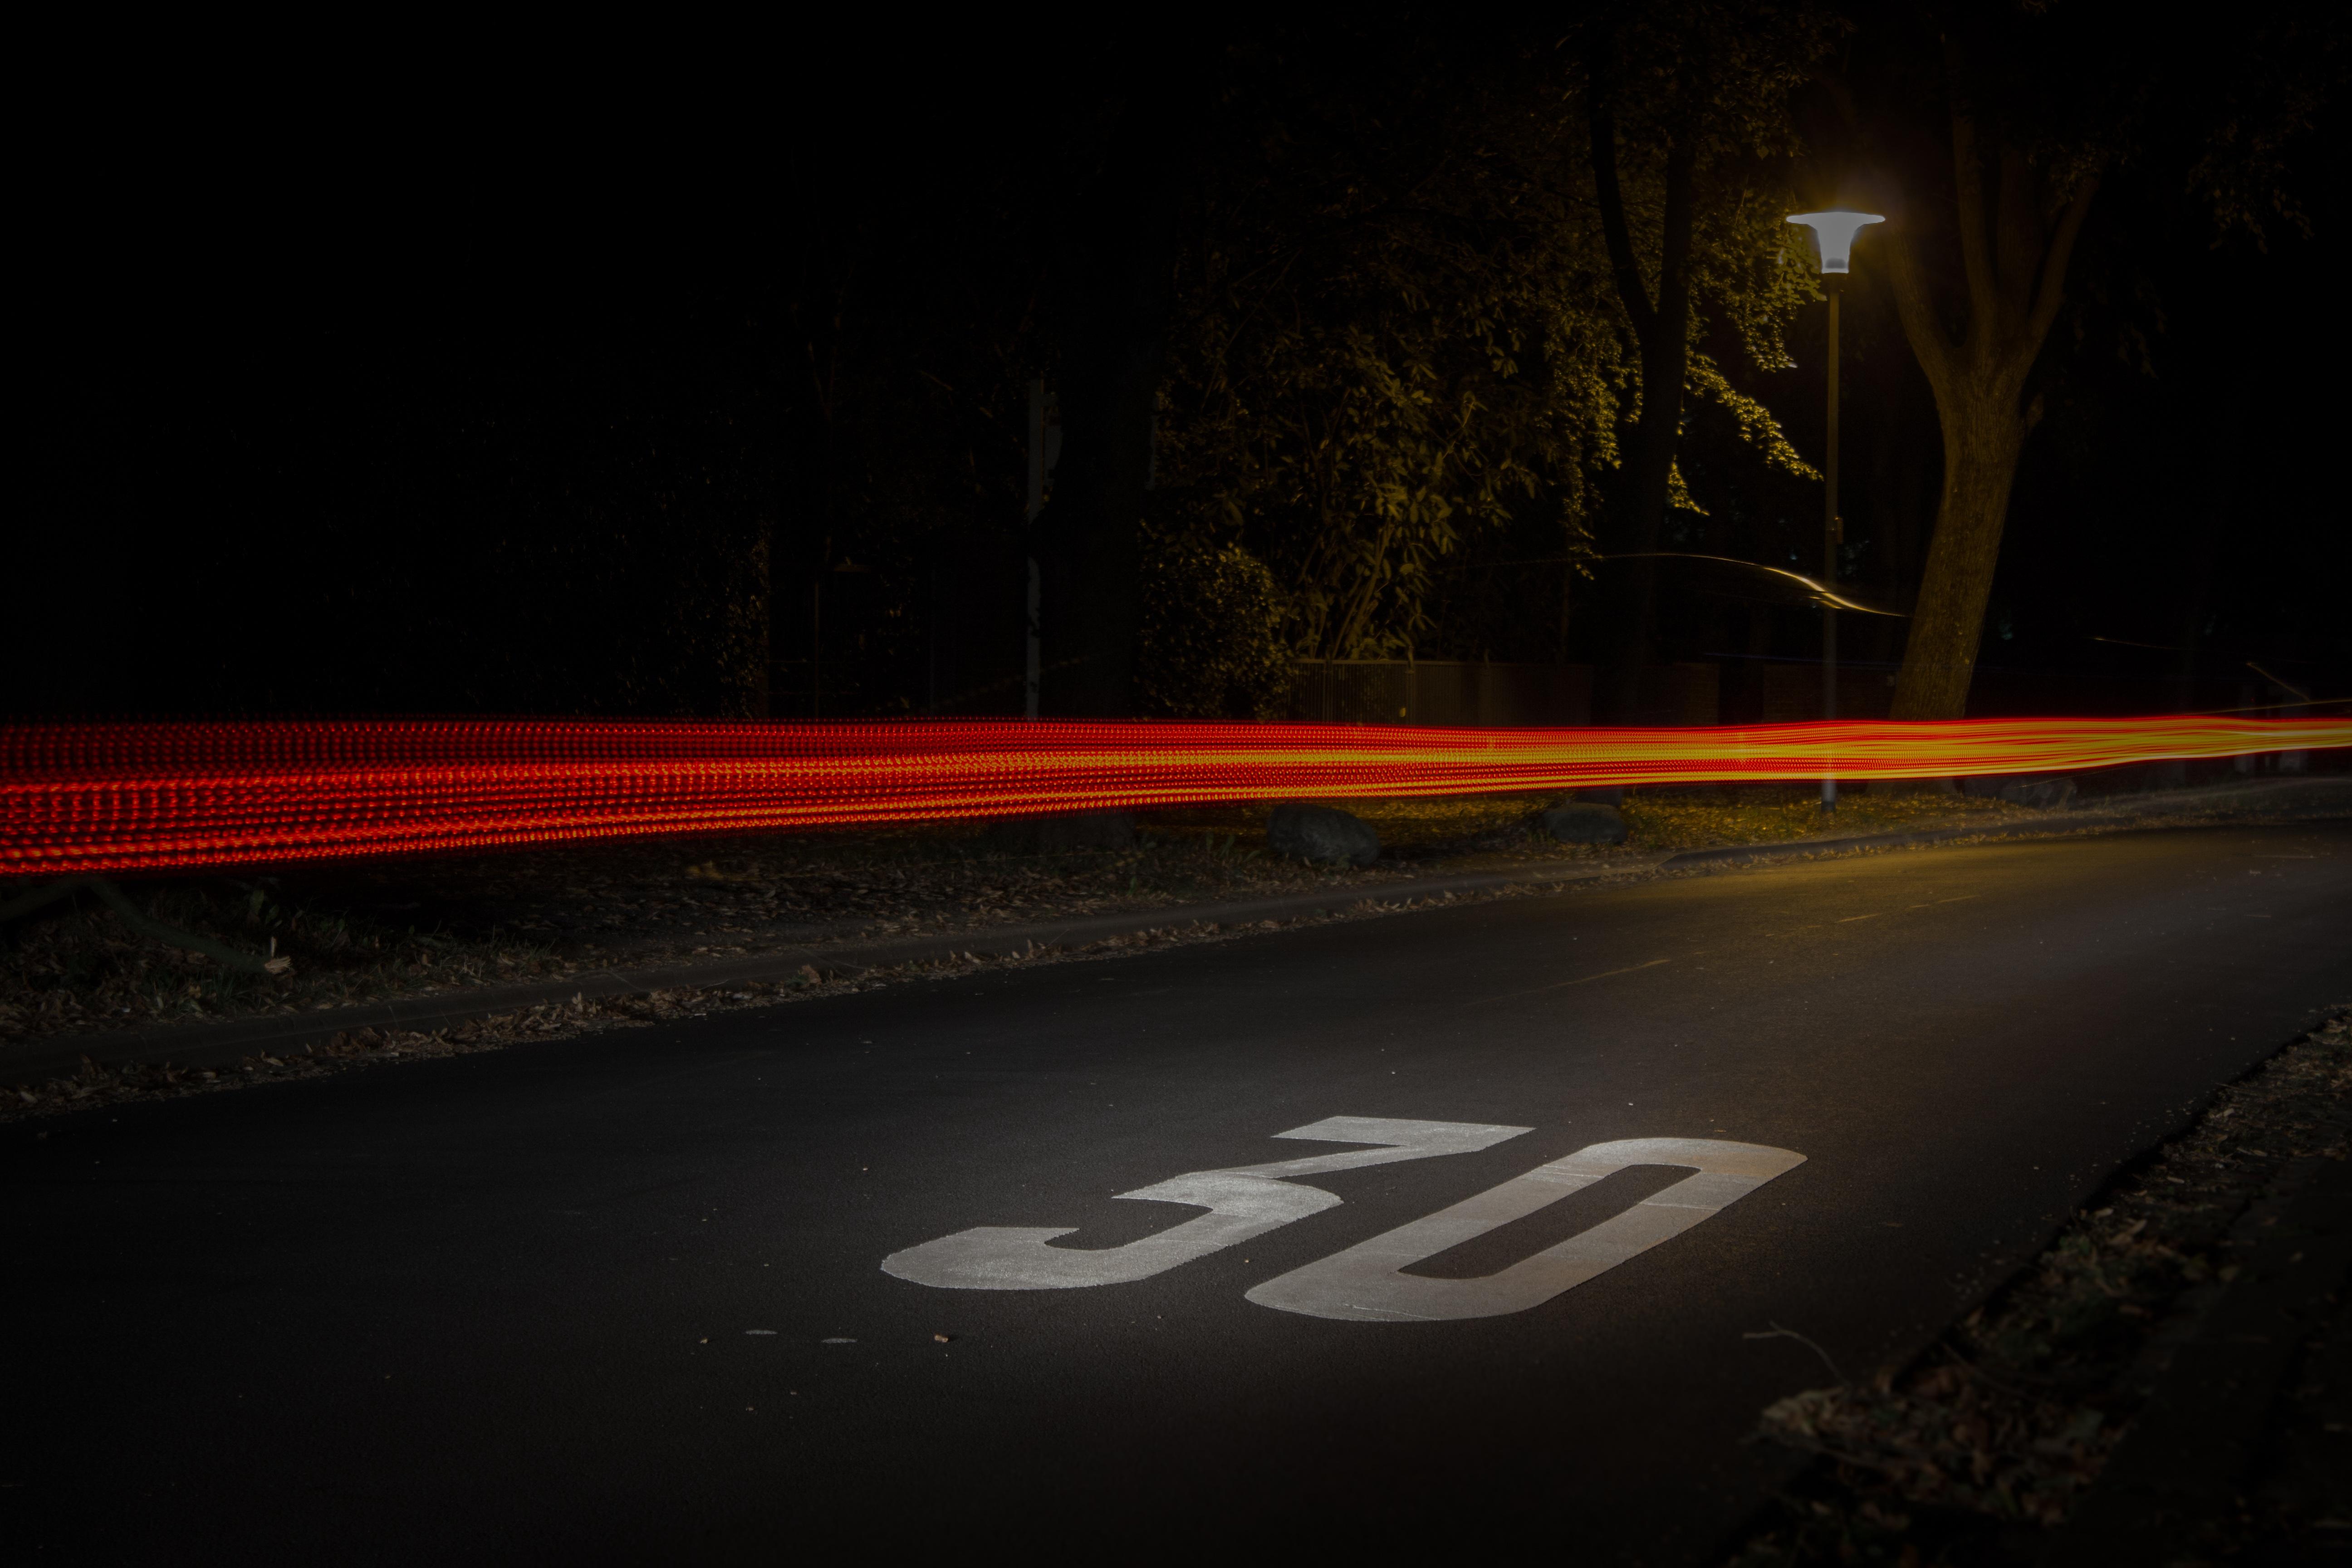 Gratis Afbeeldingen : licht, vervagen, weg, straat, nacht, snelweg ...